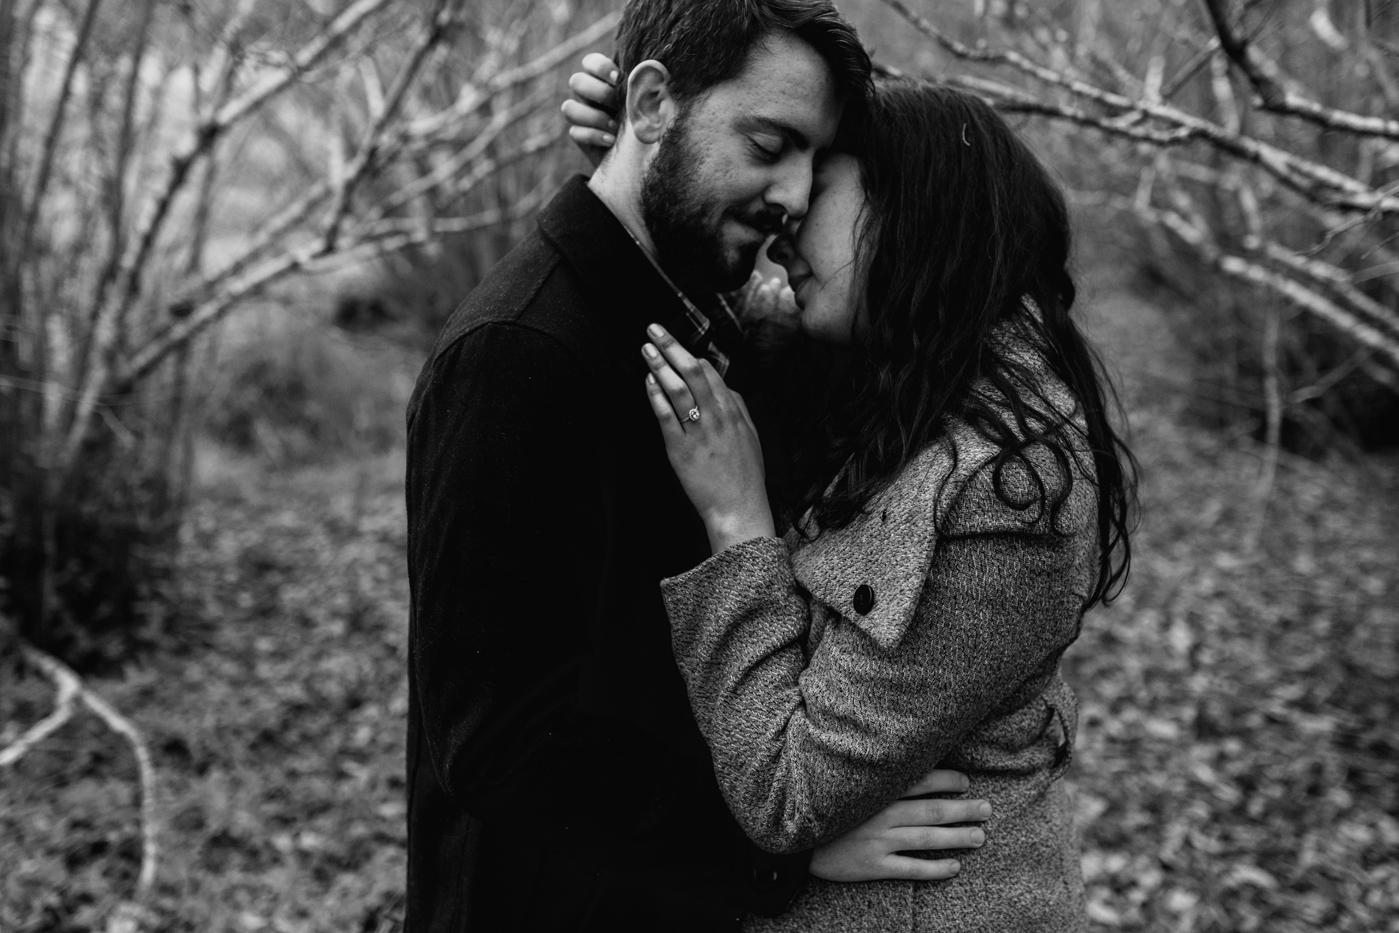 Kate & Kieran - Southern Highlands Engagement - Samantha Heather Photography-42.jpg